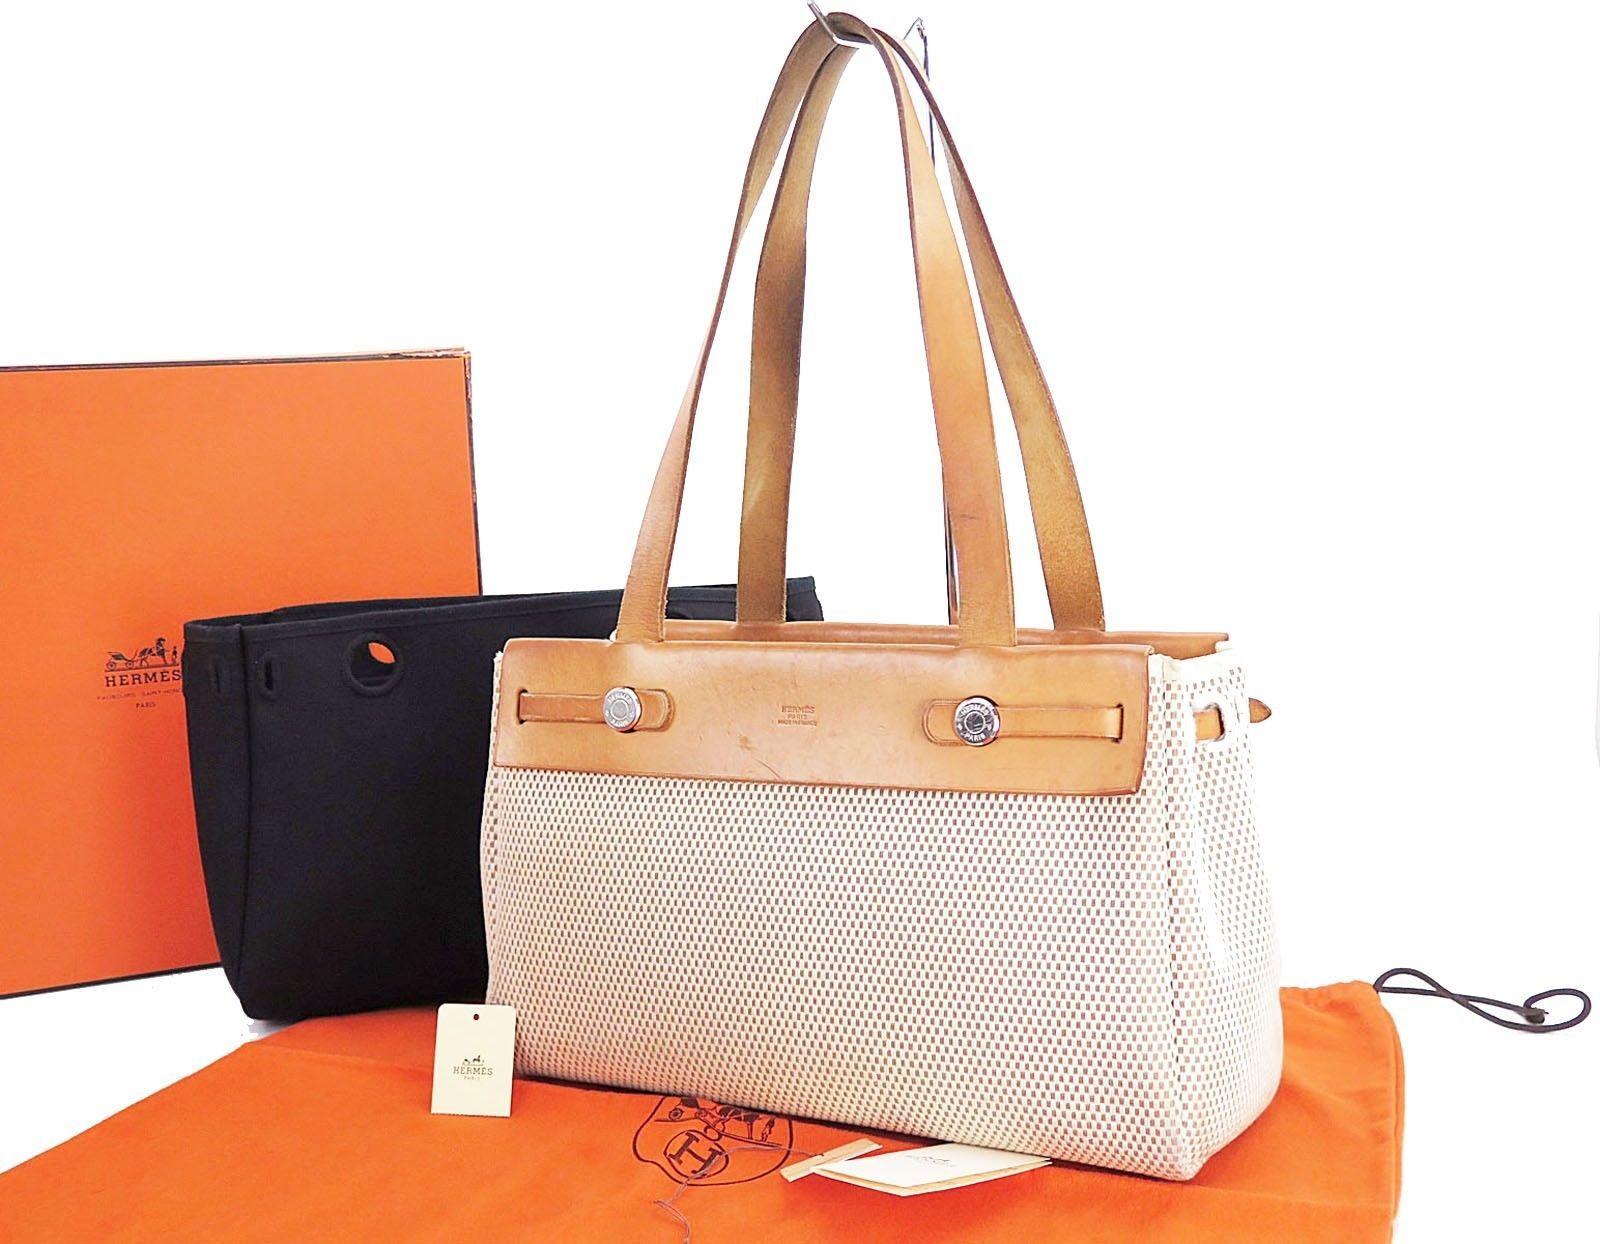 Auth HERMES Her Bag Cabas PM Beige Black Canvas Shoulder Tote Bag Purse   26117 d64a296499